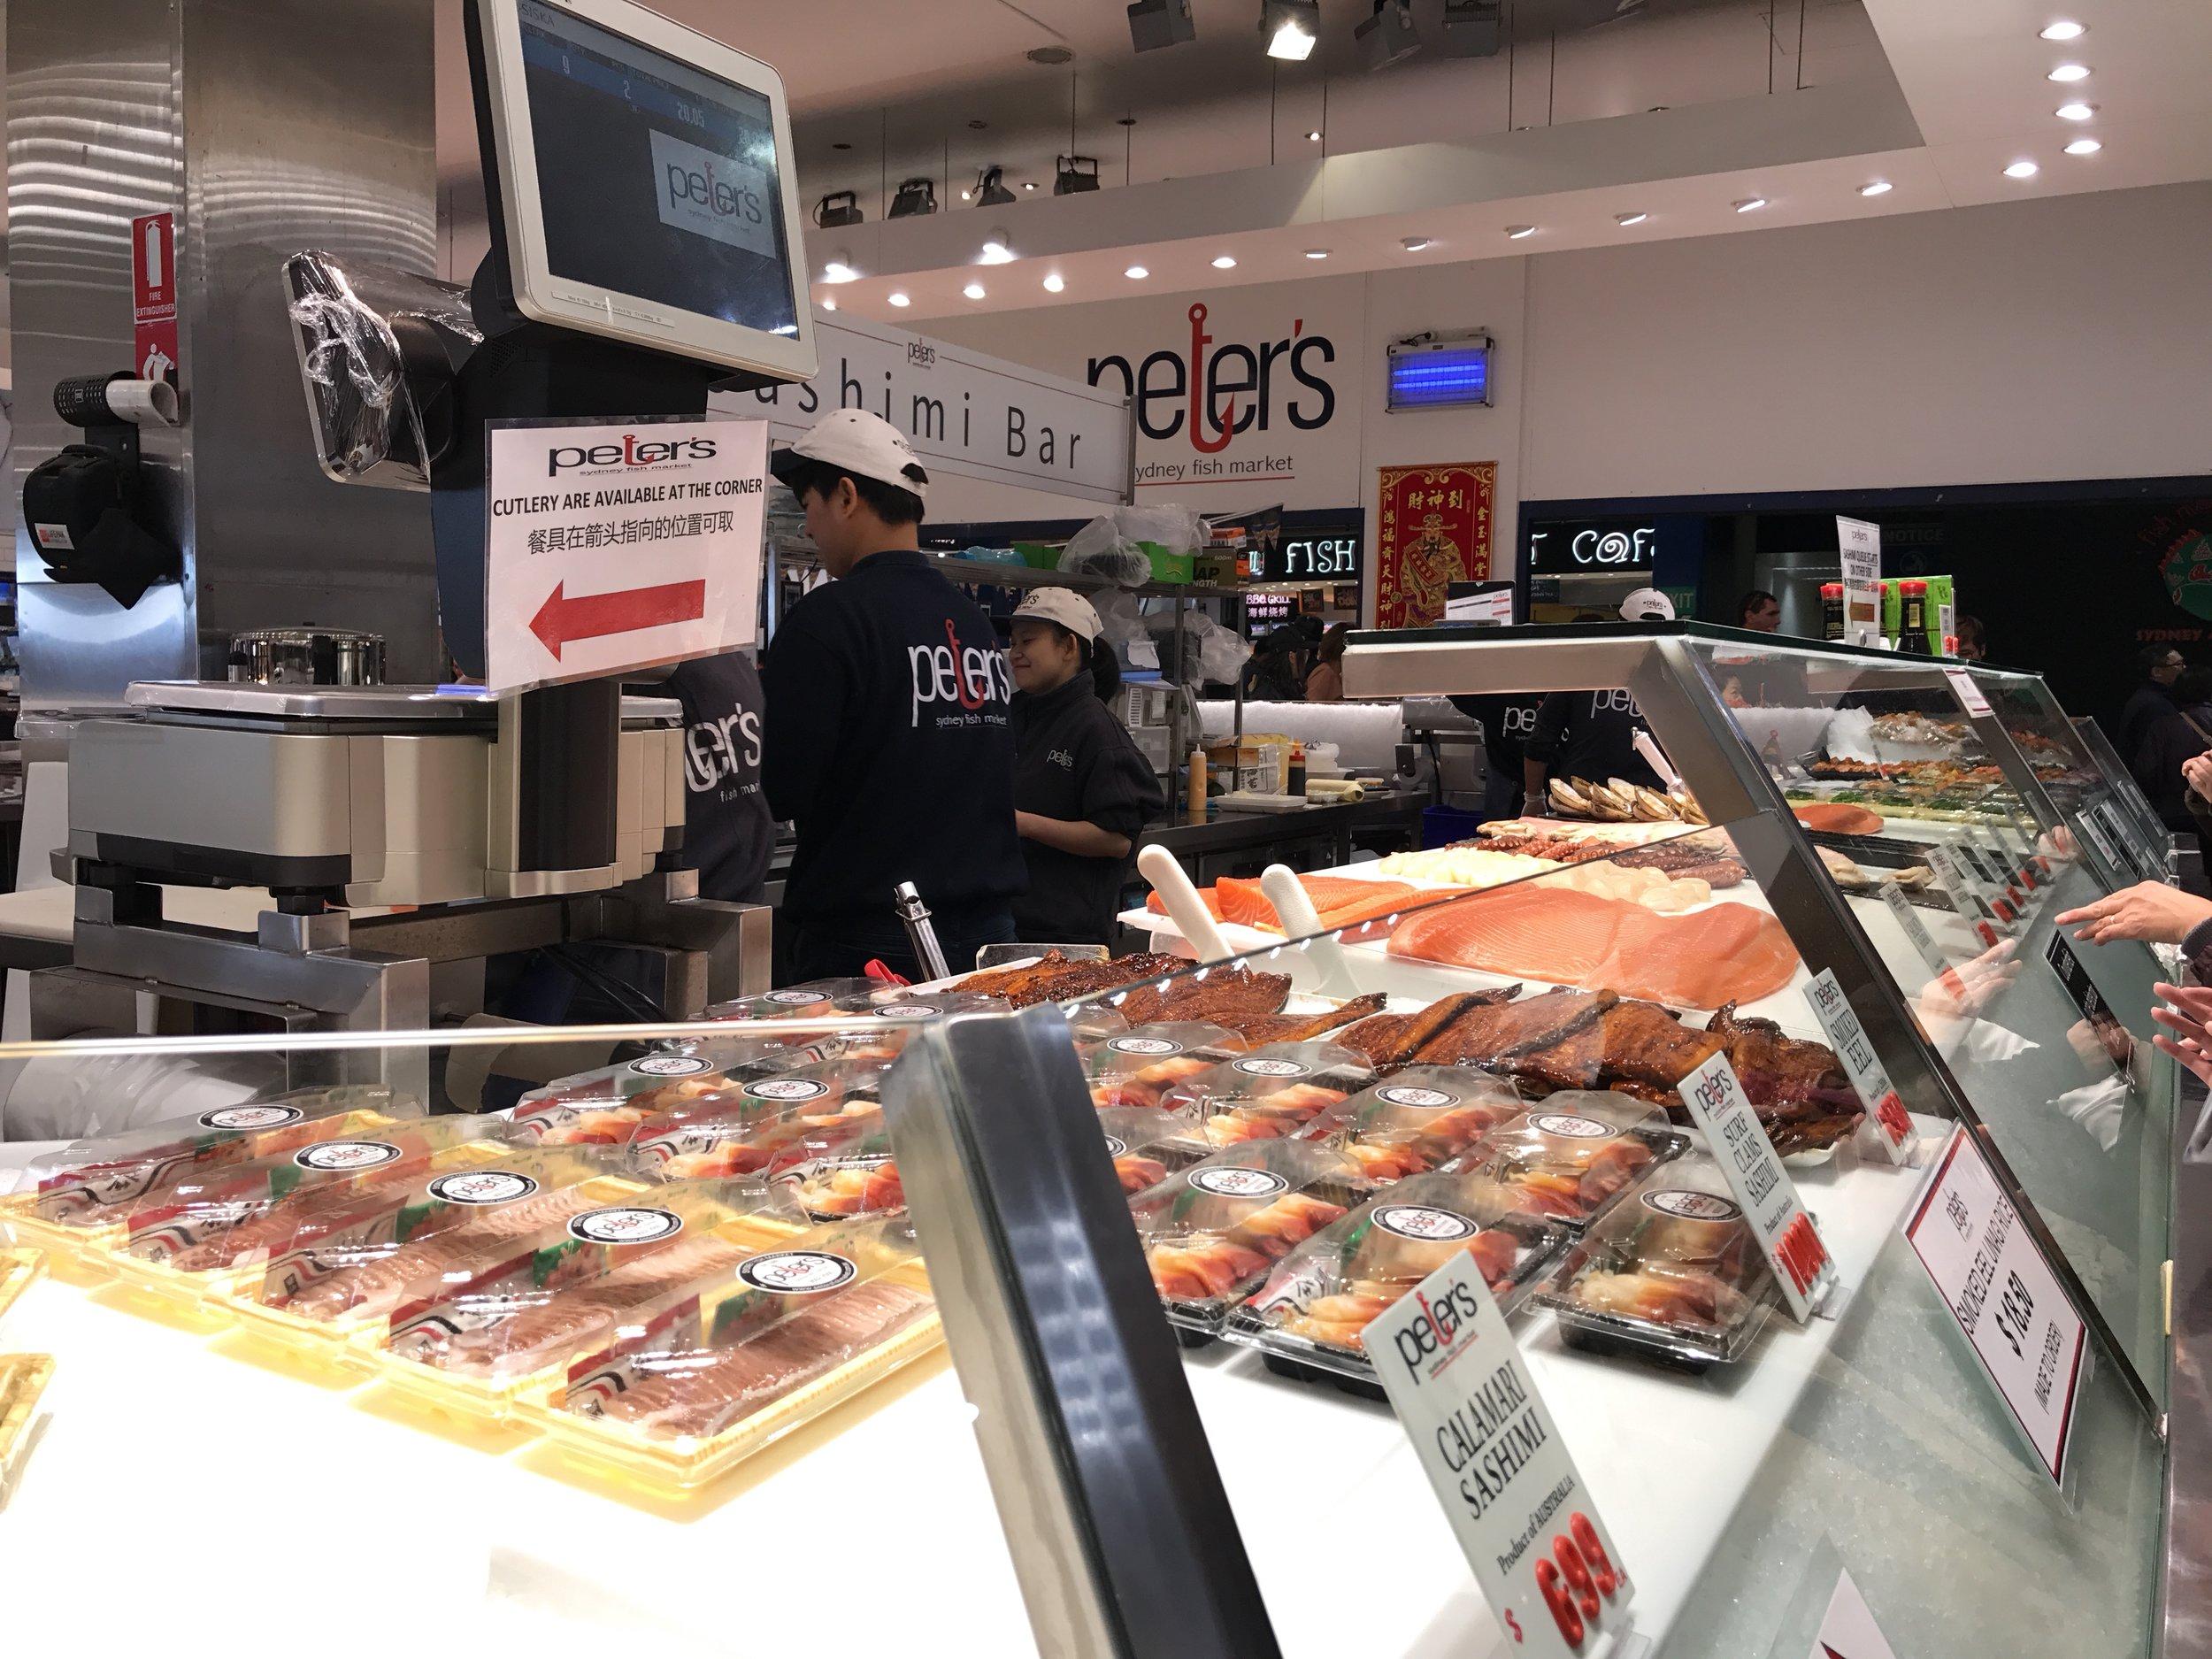 Peters-sydney-fish-market.jpg